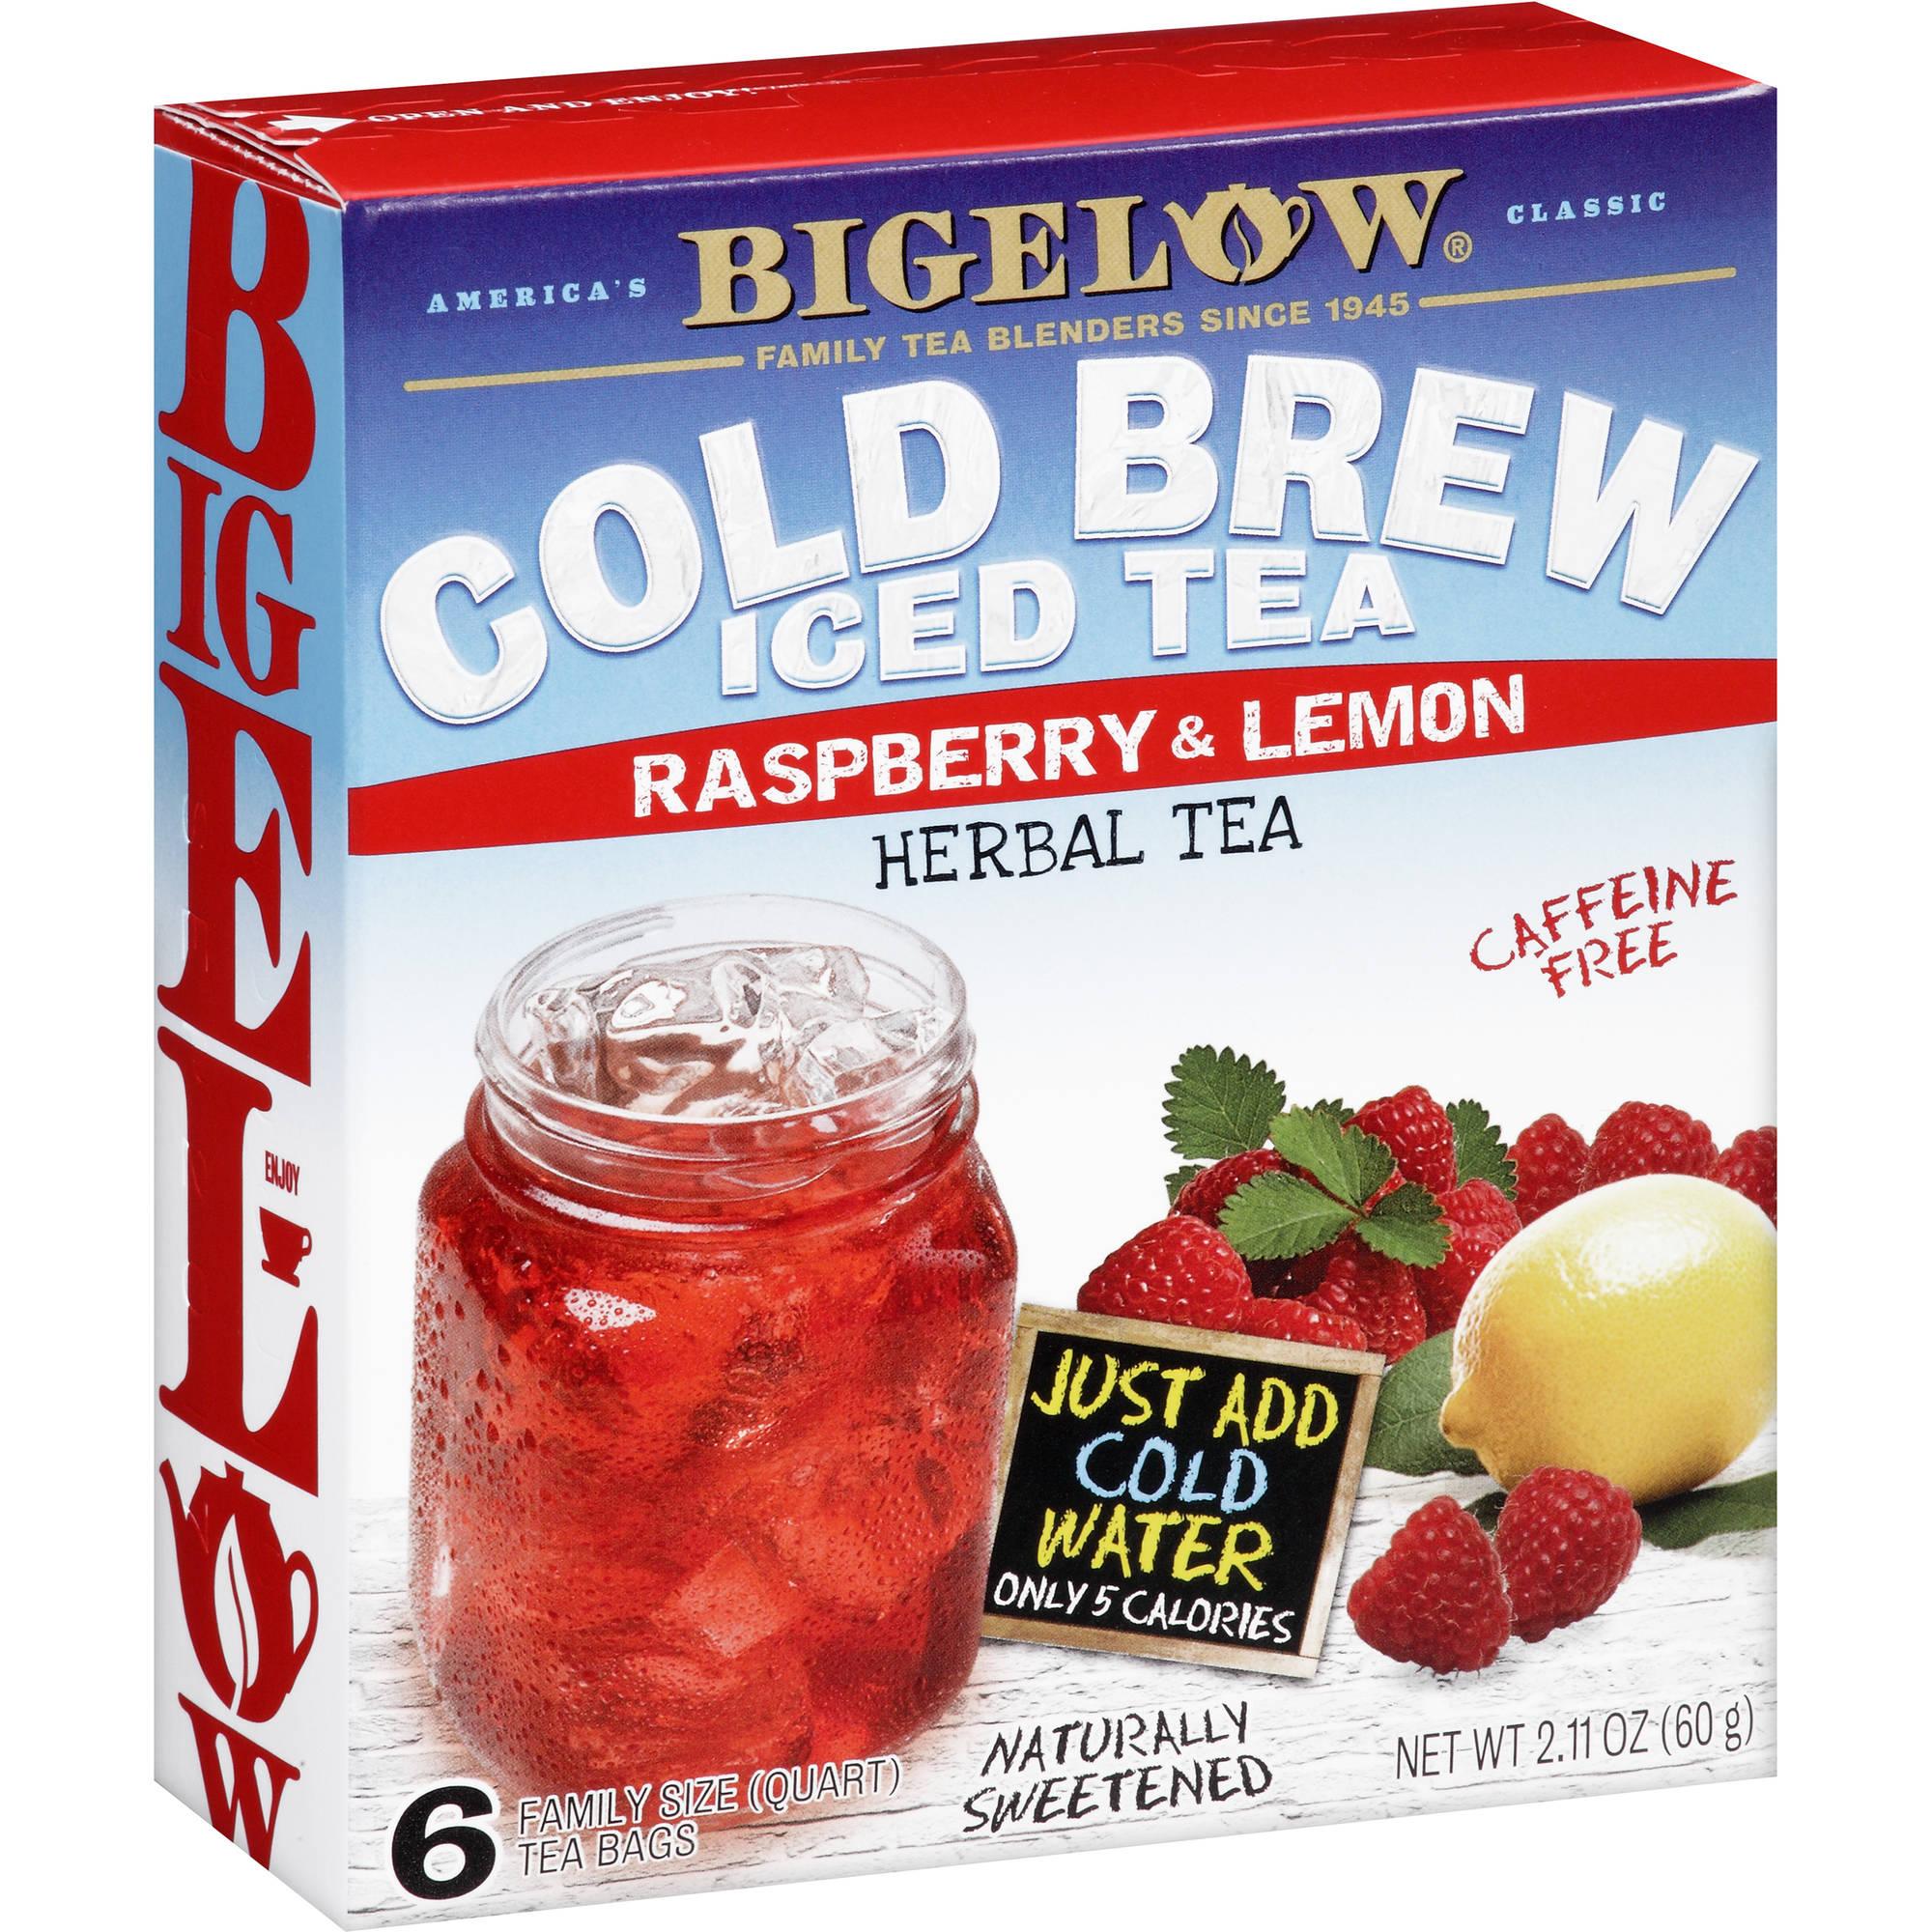 Bigelow Cold Brew Iced Tea Raspberry & Lemon Herbal Tea, 6 count, 2.11 oz